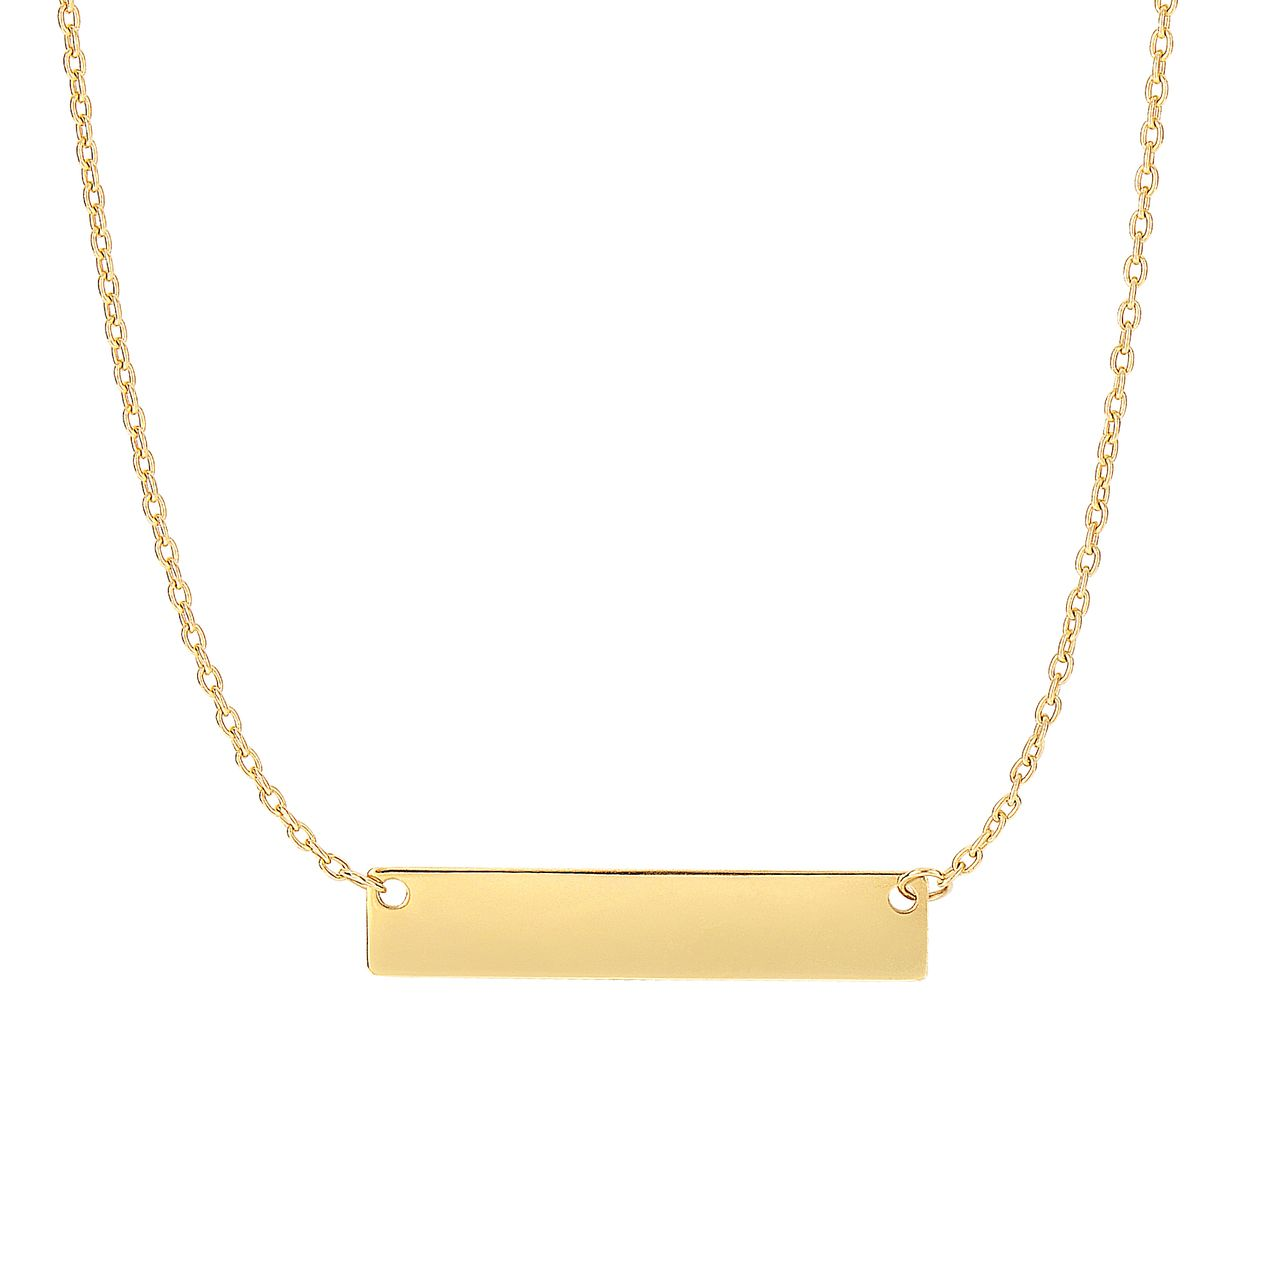 14k Gold Fancy Engravable Bar Necklace Engraved Bar Necklace Bar Pendant Necklace Horizontal Bar Necklace